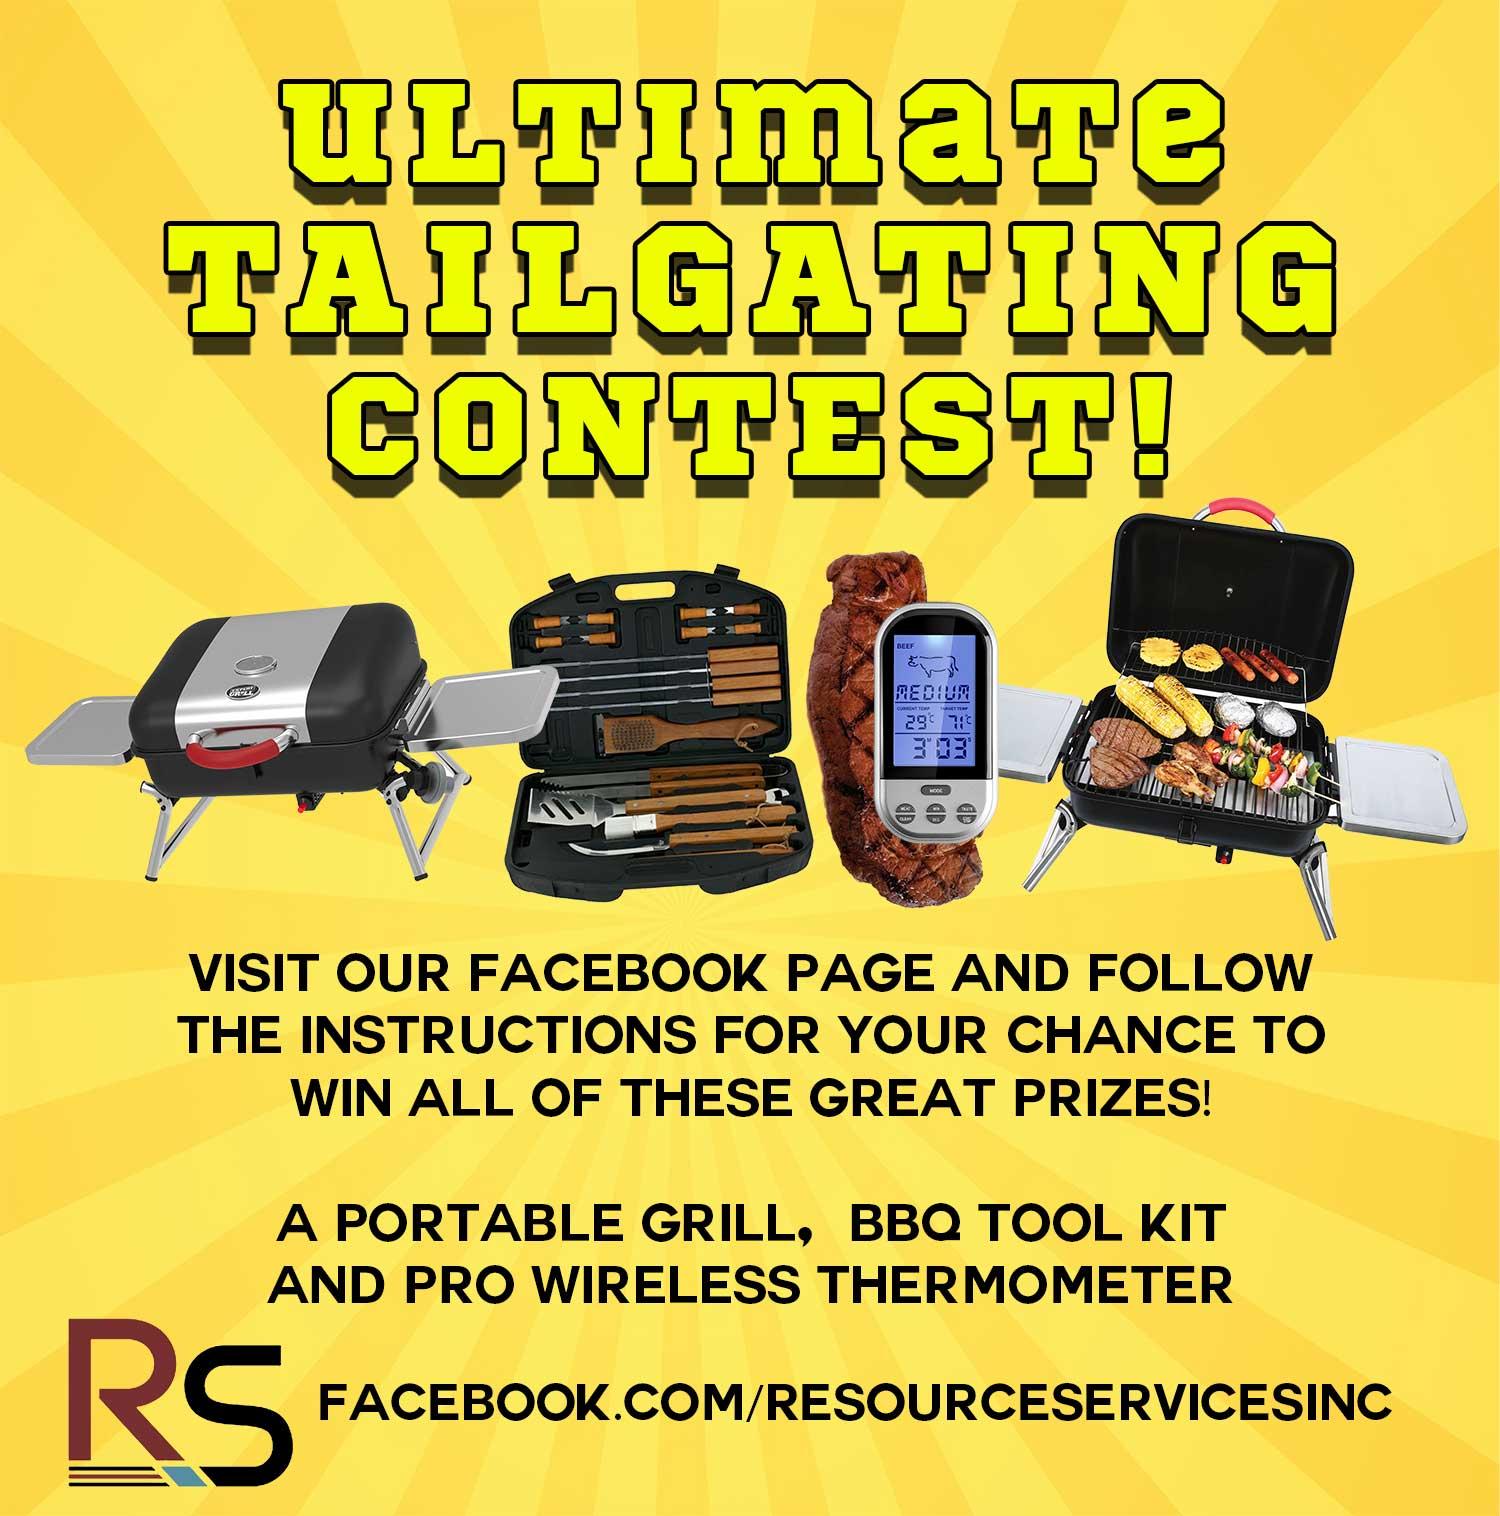 ultimate tailgating contest Altoona IA